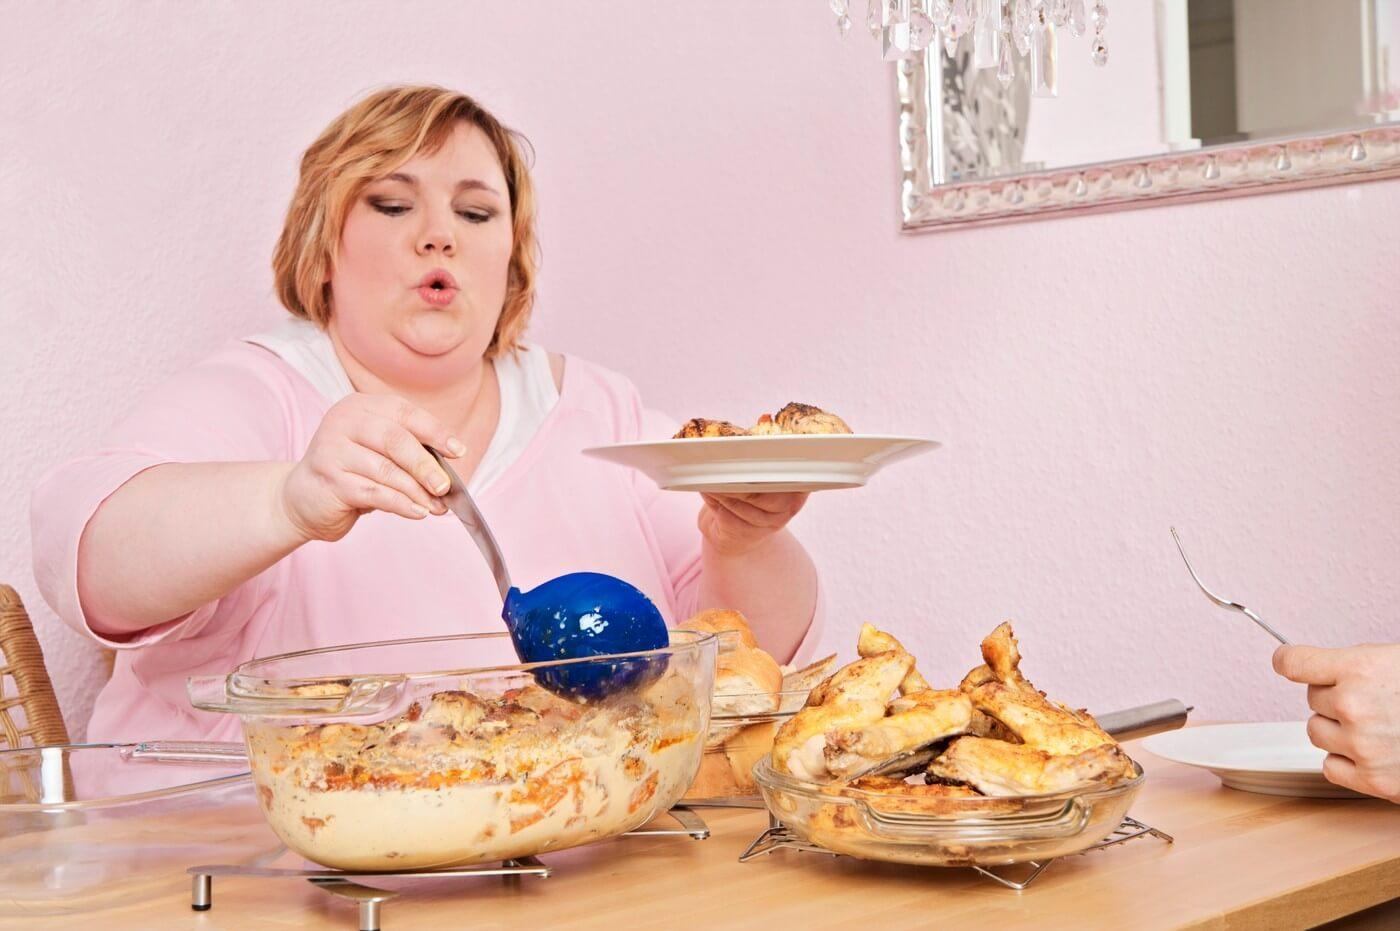 на кухне толстая девушка картошка